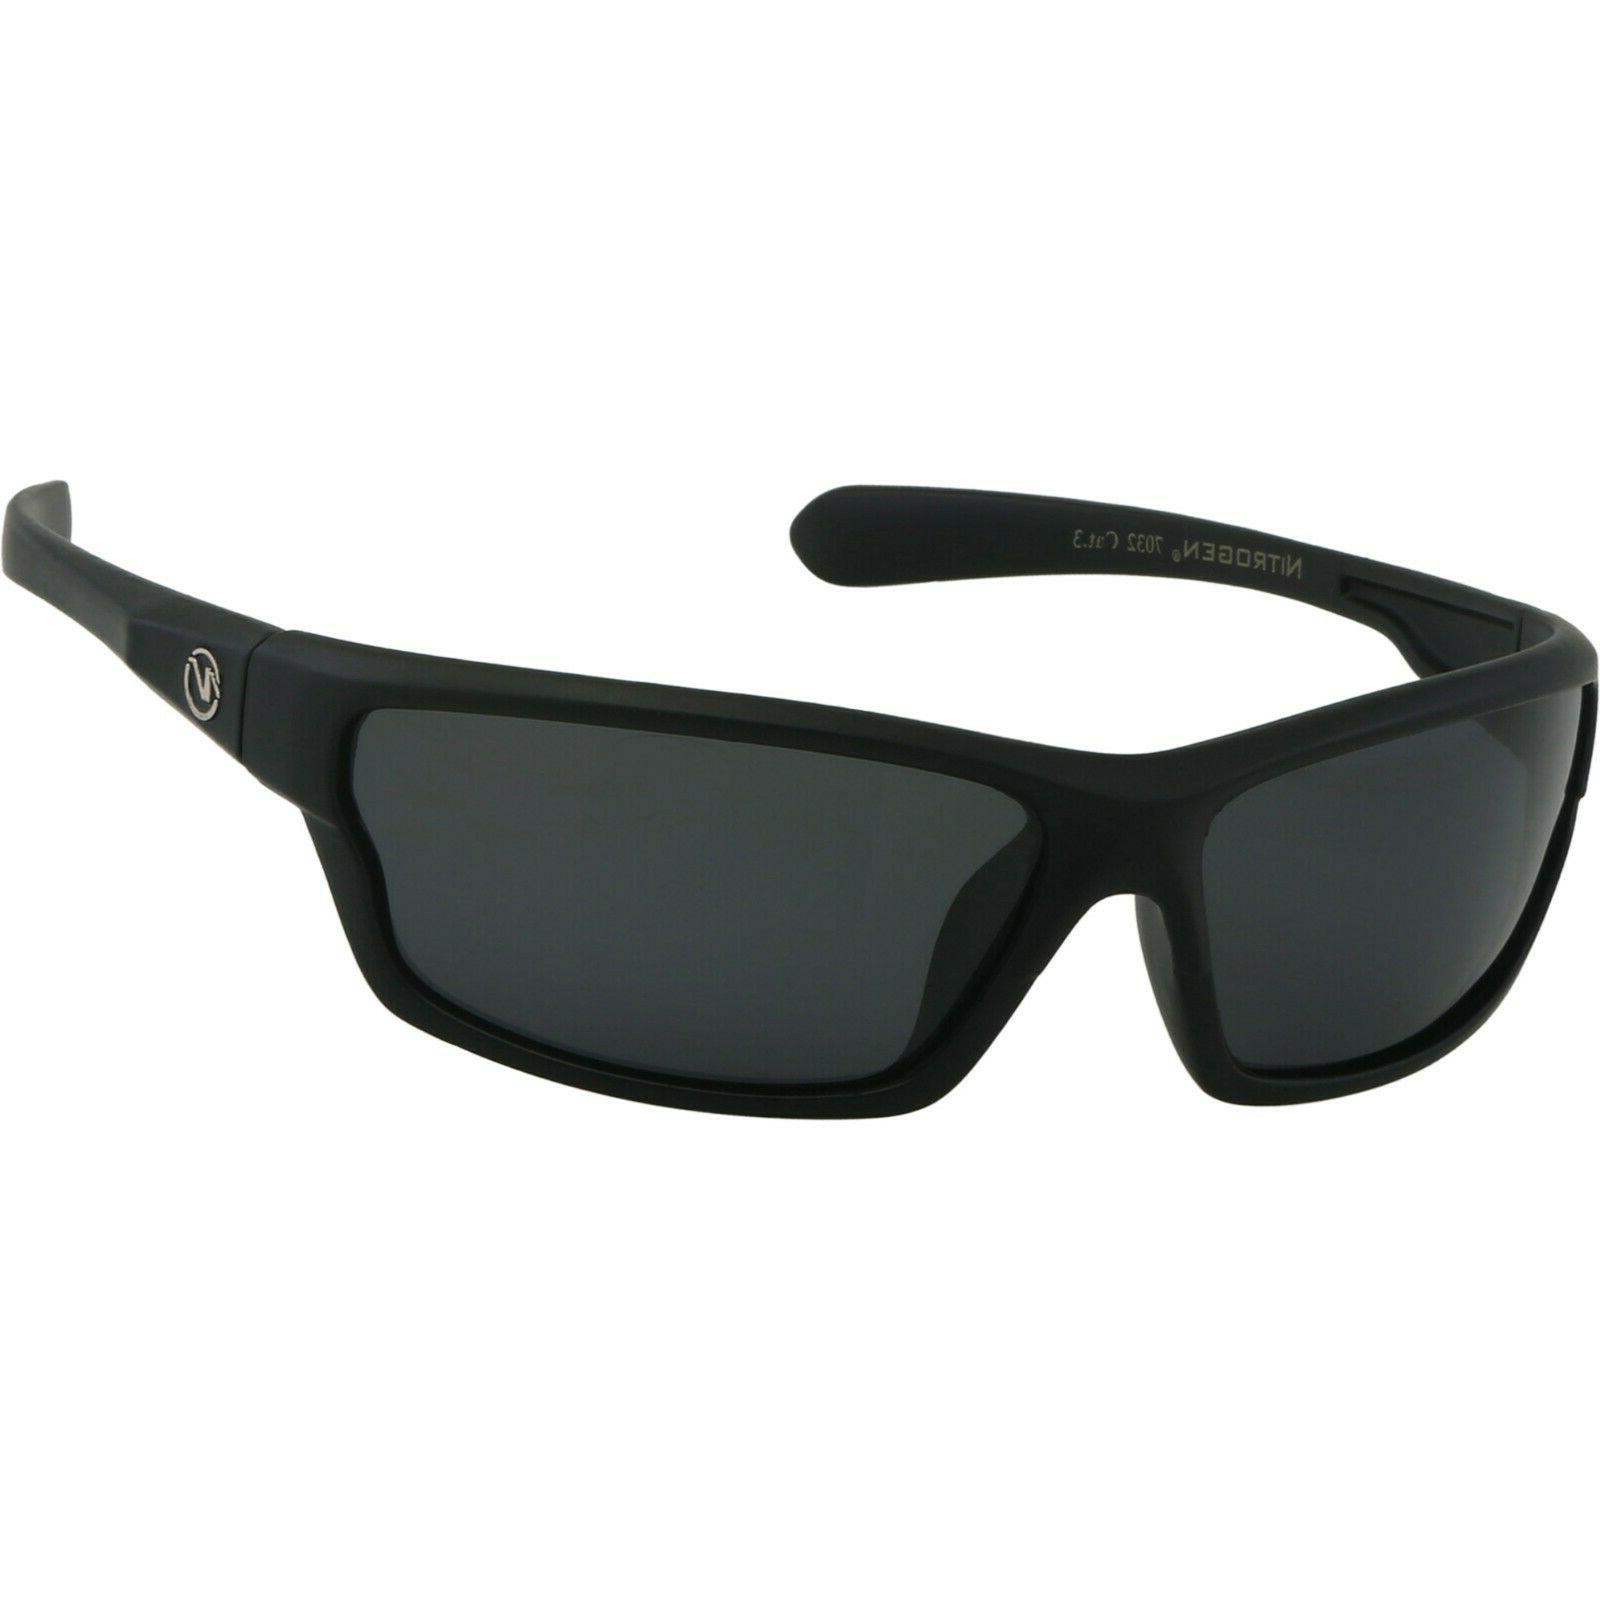 Nitrogen Polarized Sport Driving Glasses